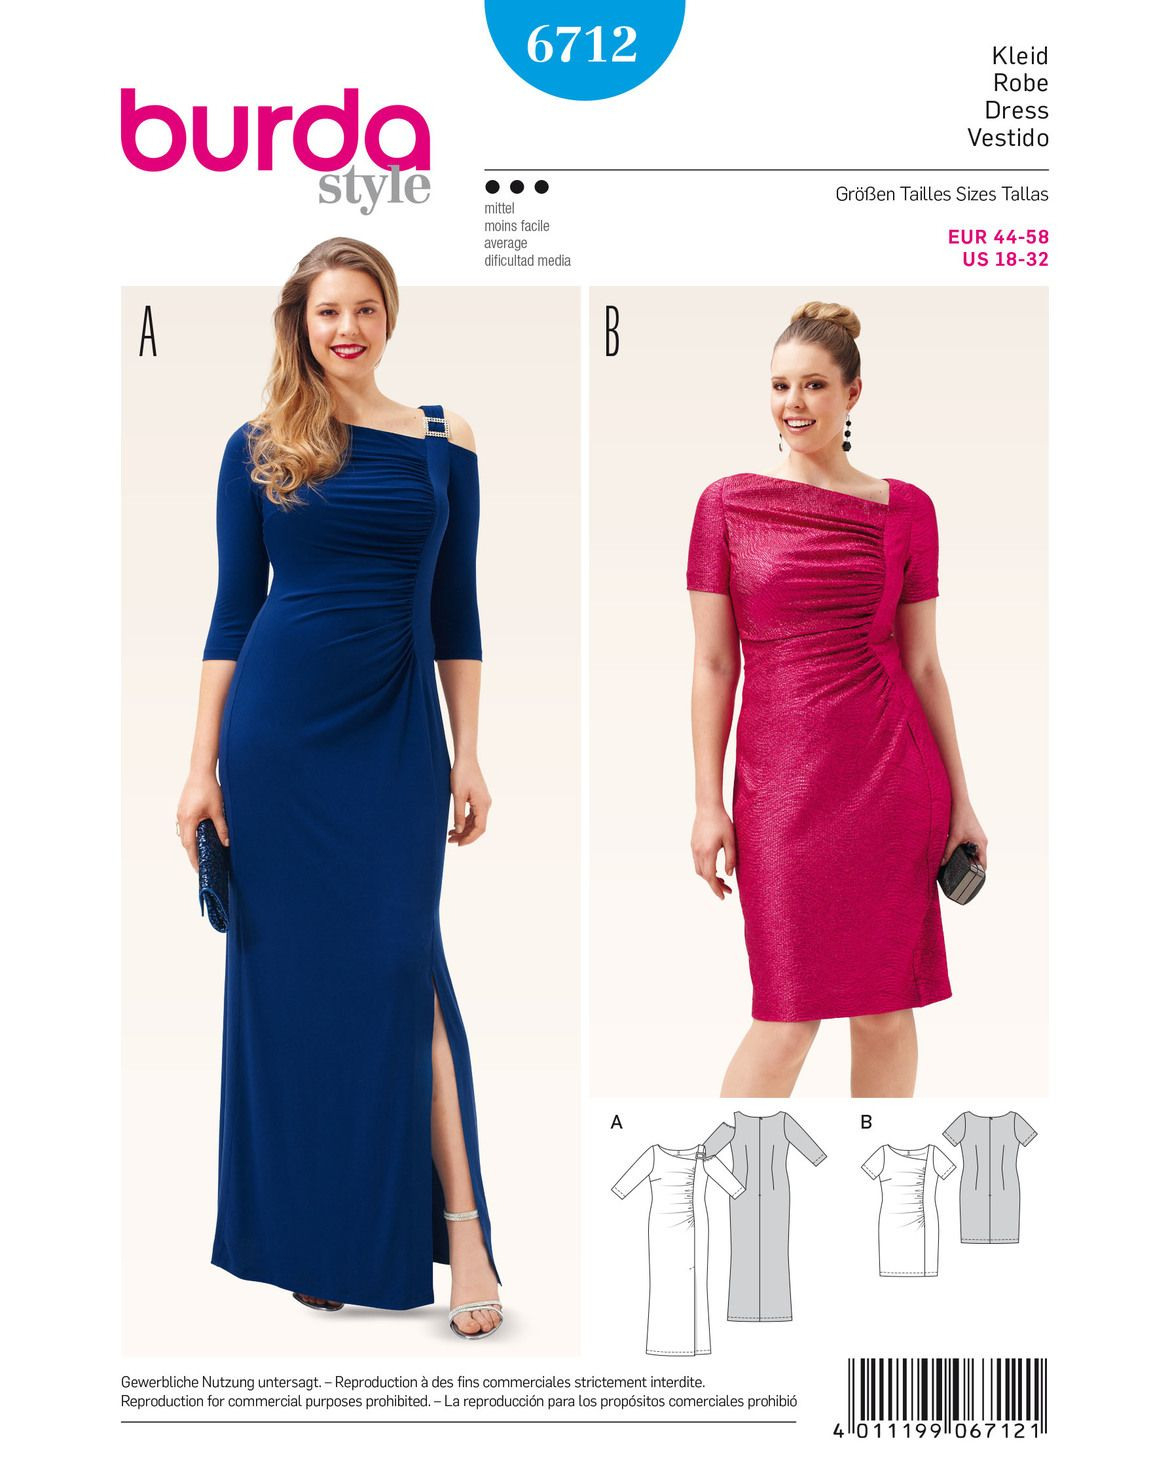 Abend Elegant Xscape Abendkleid Stylish13 Cool Xscape Abendkleid Galerie